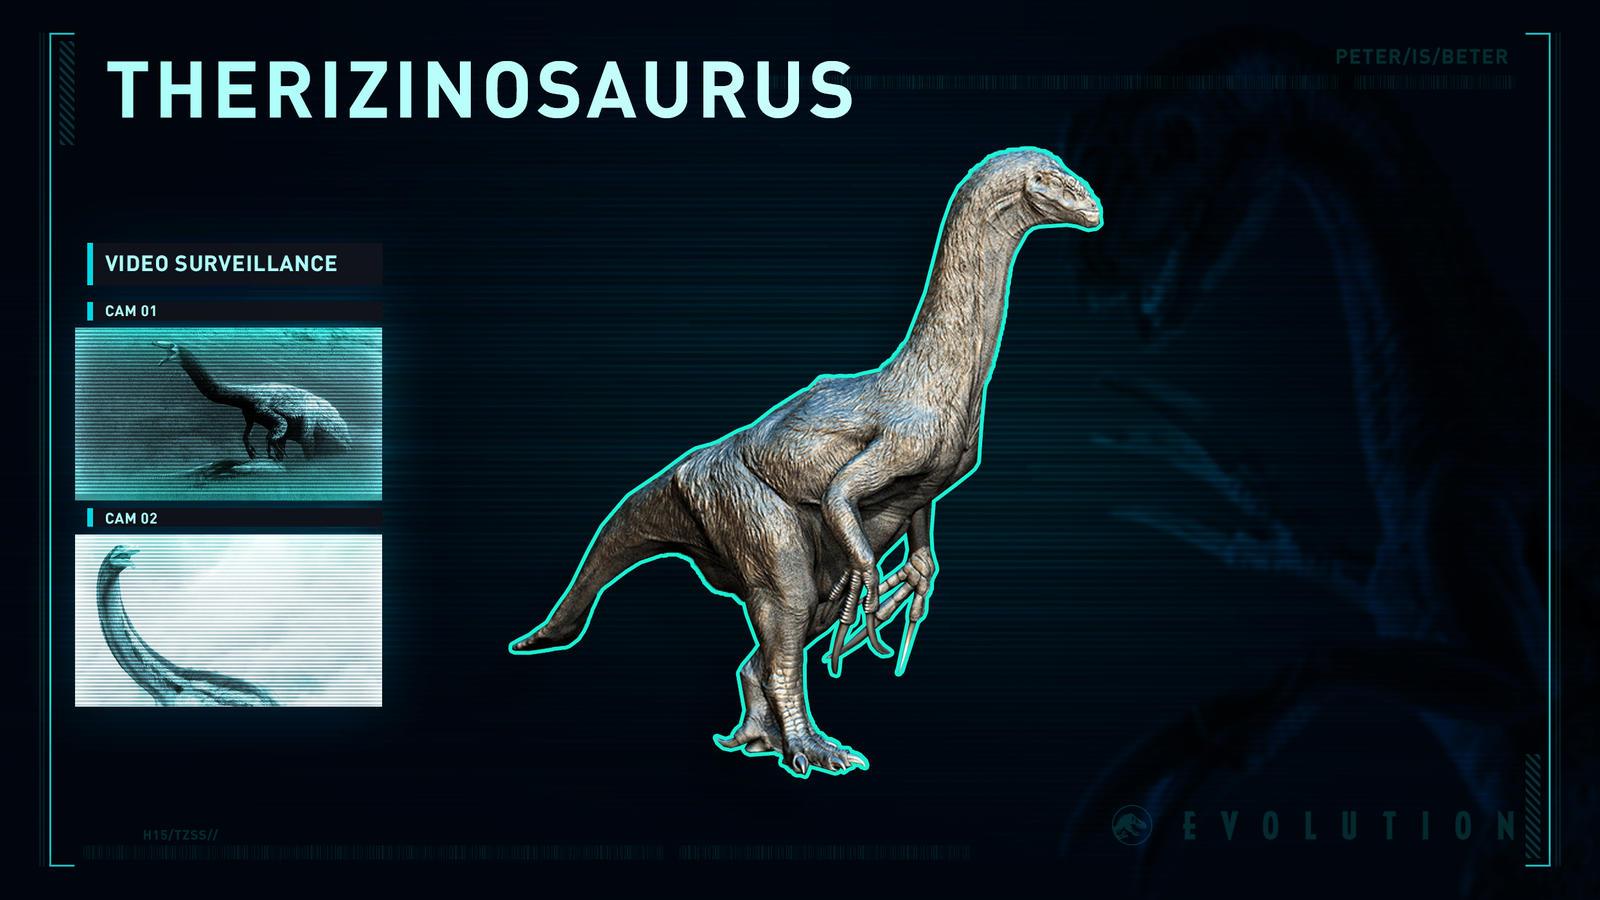 Jurassic World Evolution Therizinosaurus by PeterisBeter on